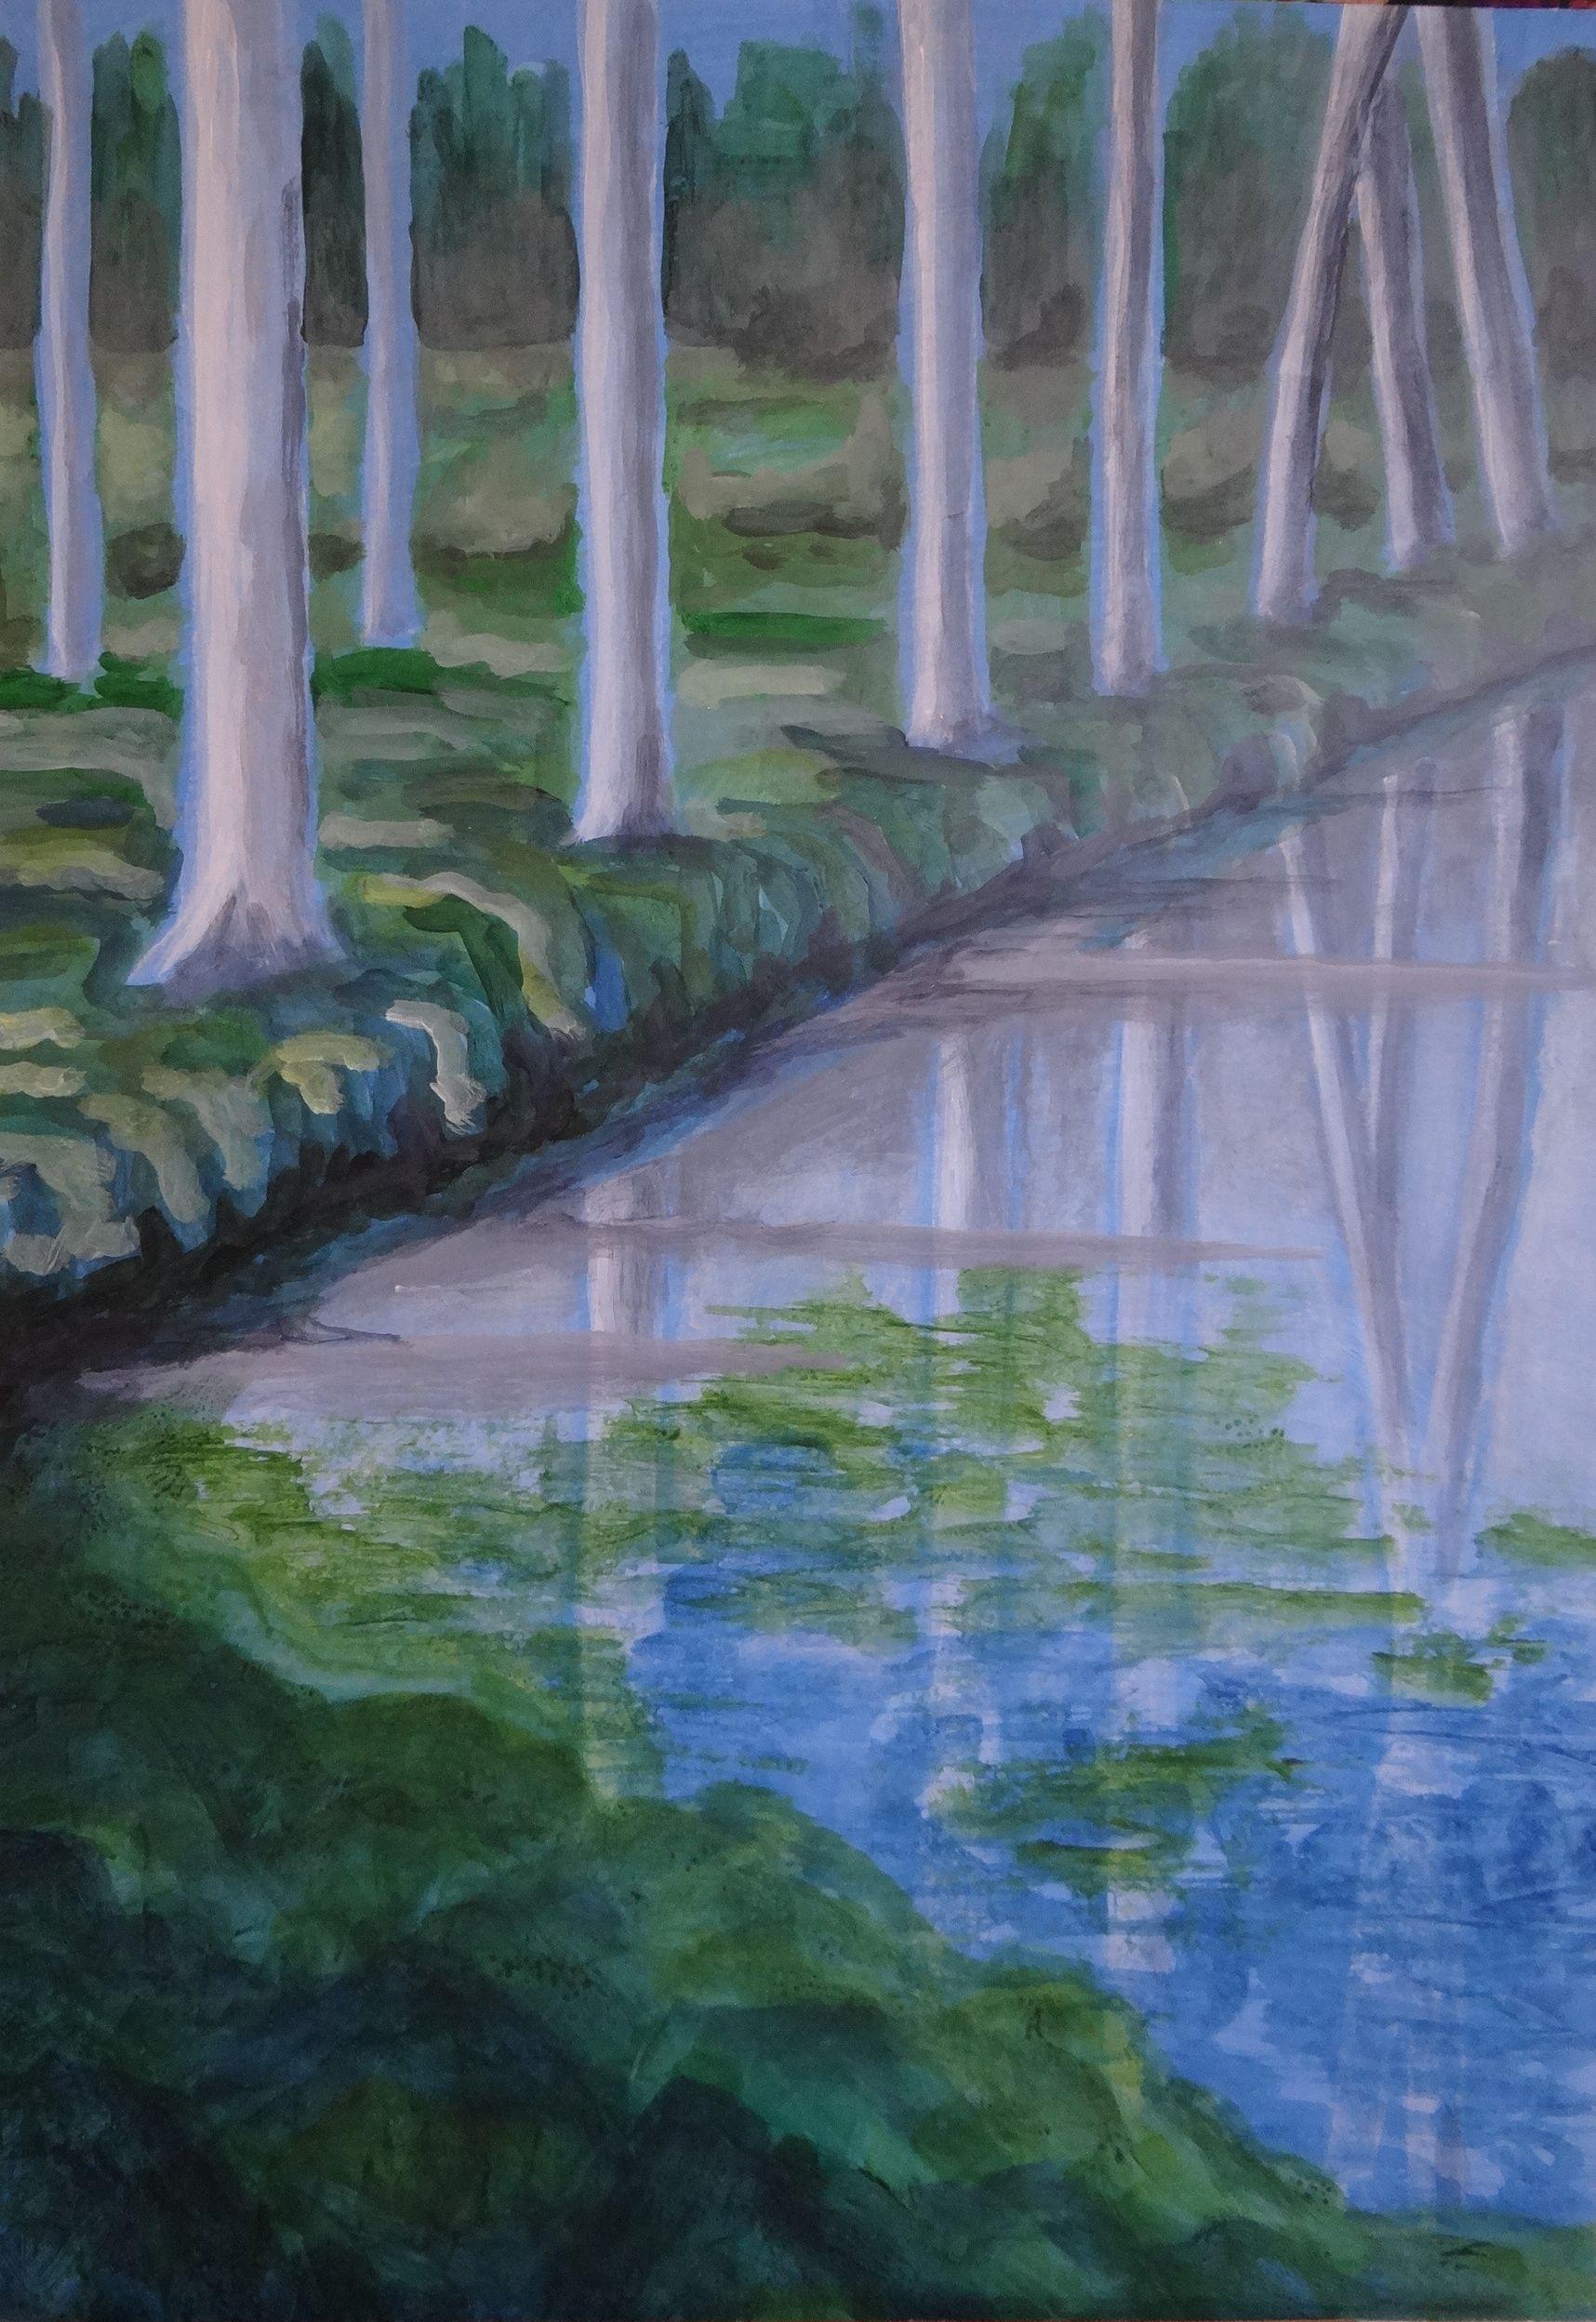 Bomen spiegeling blauw/groen acryl op papier op mdf 50x70